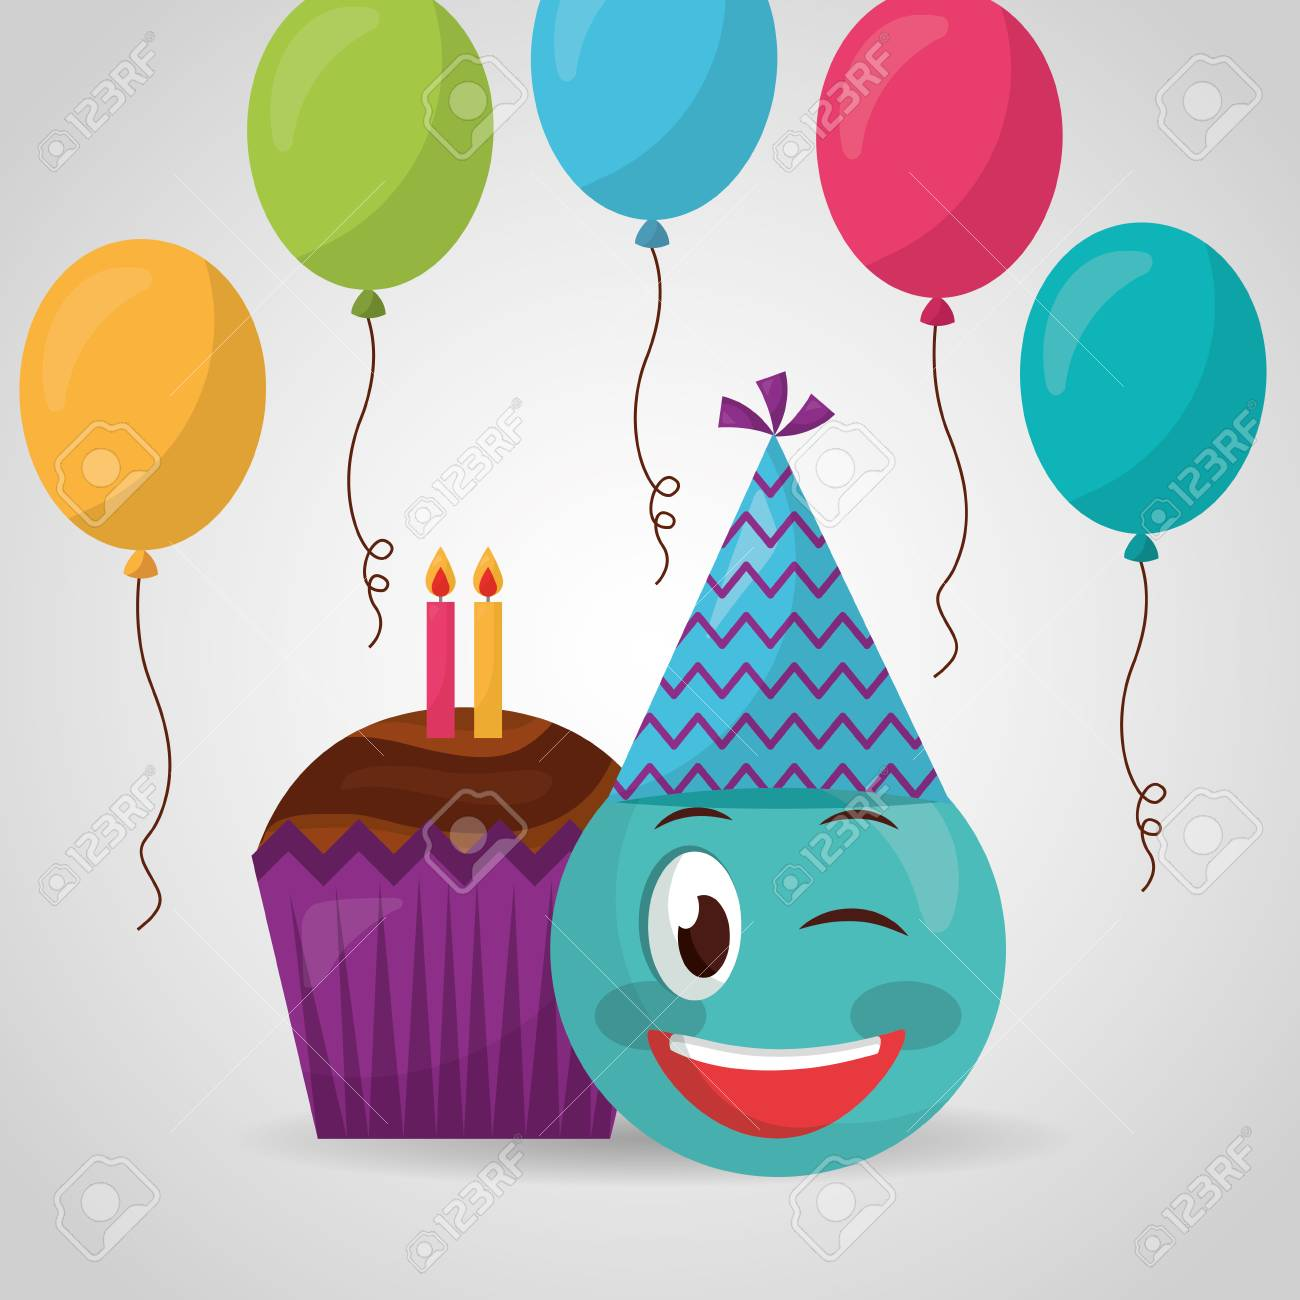 Happy Birthday Emoji Stinging The Eye Balloons Cake Candles Vector Illustration Stock